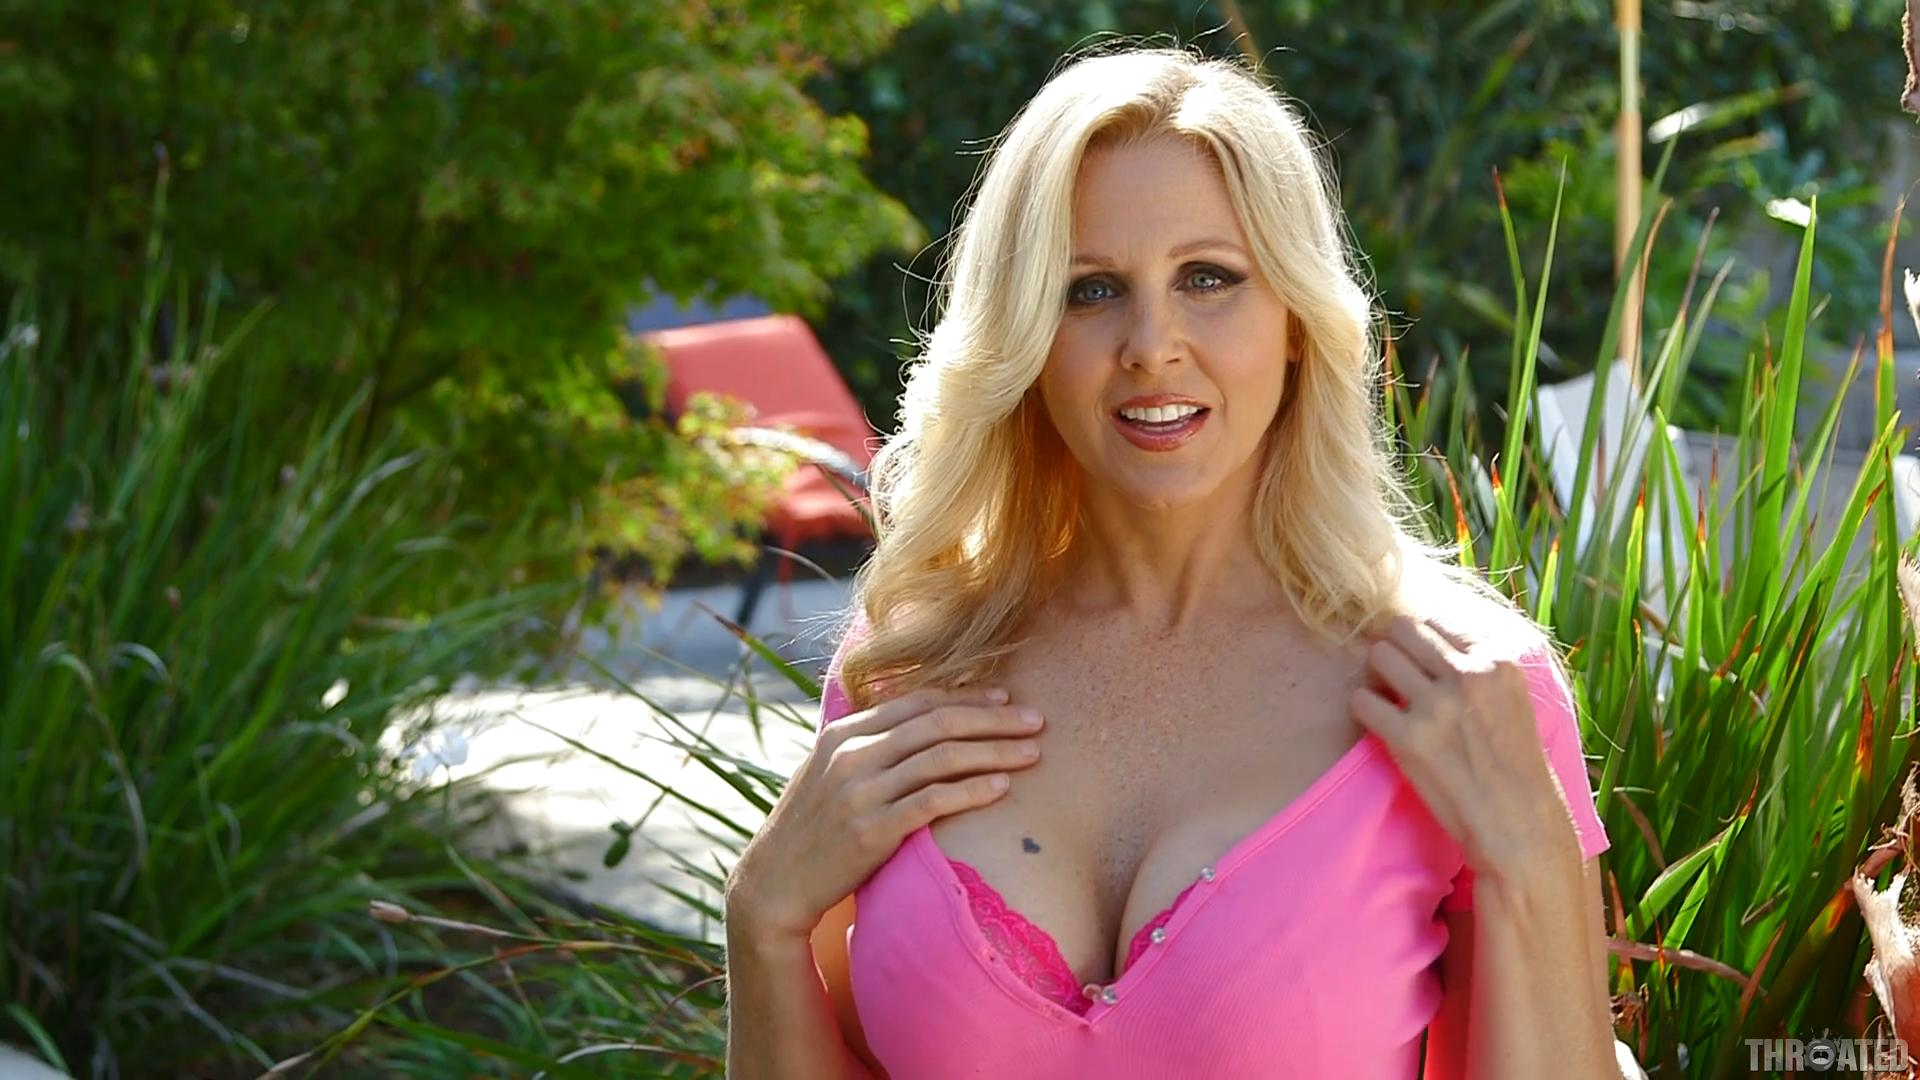 Blowjobs Oral Sex Your Best Porn Source T.h.r.o.a.t.e.d Julia Ann